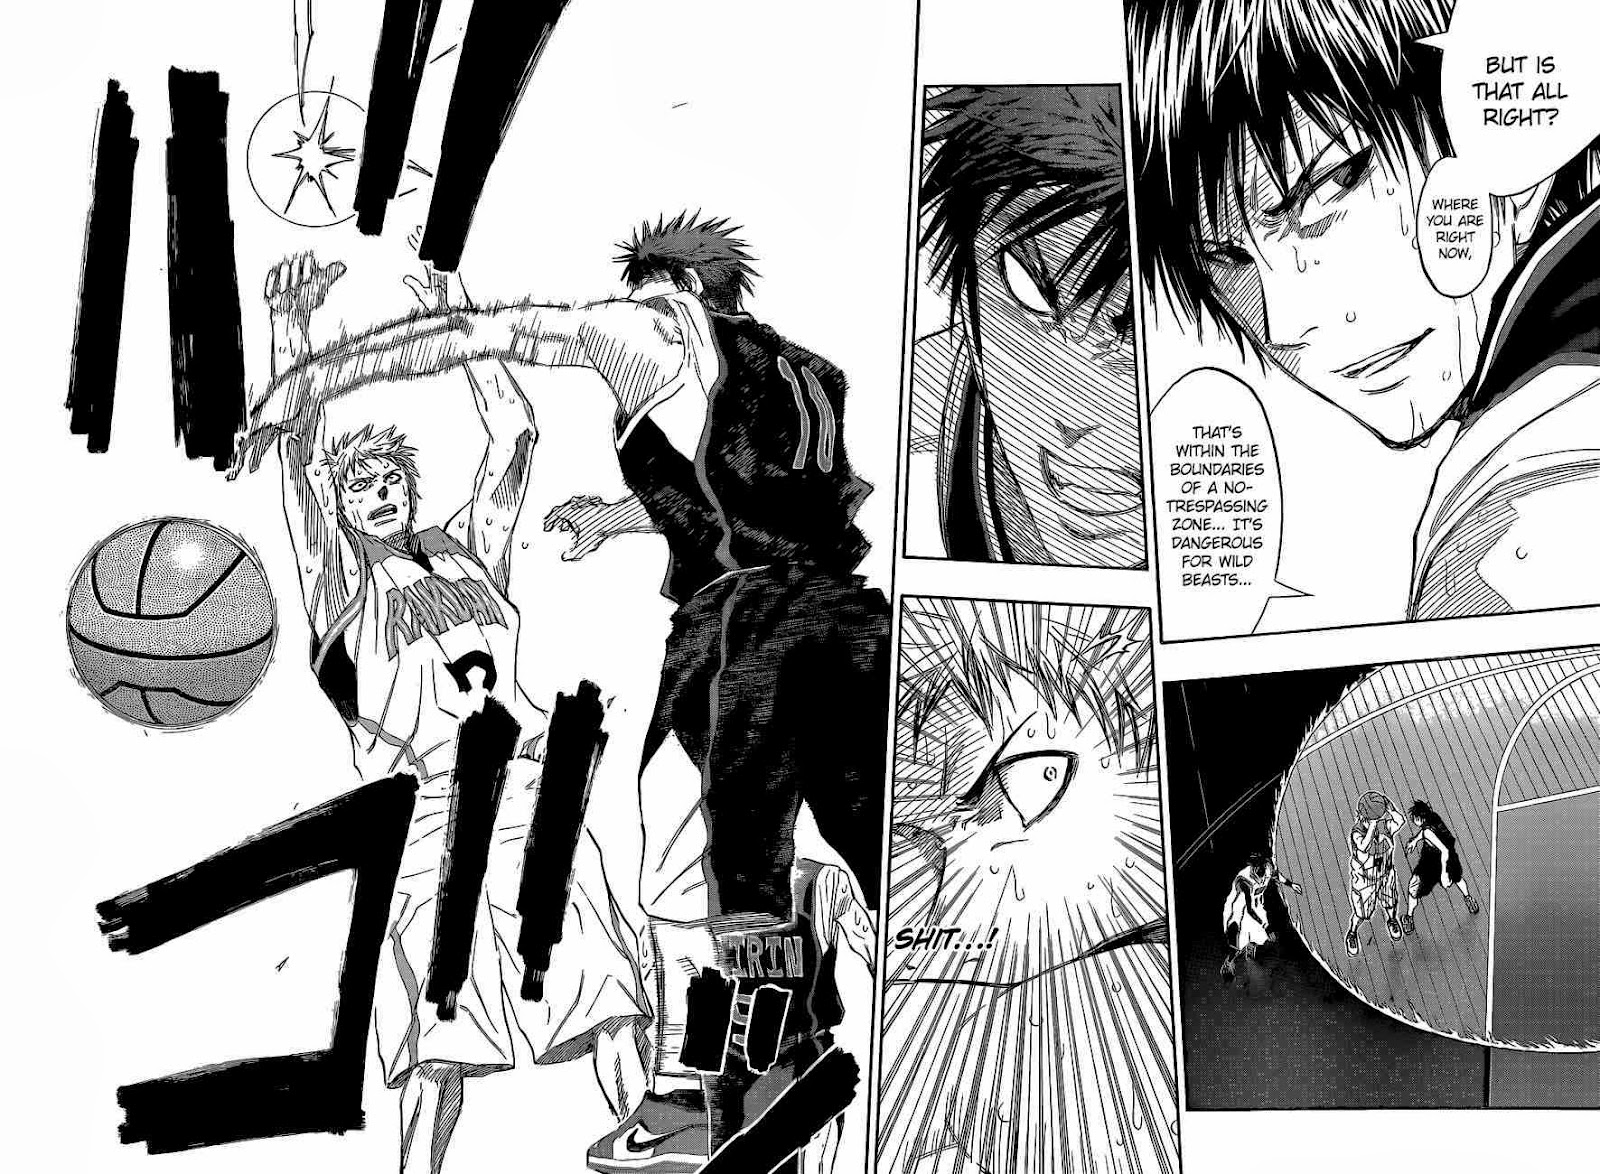 Kuroko no Basket Manga Chapter 254 - Image 10-11